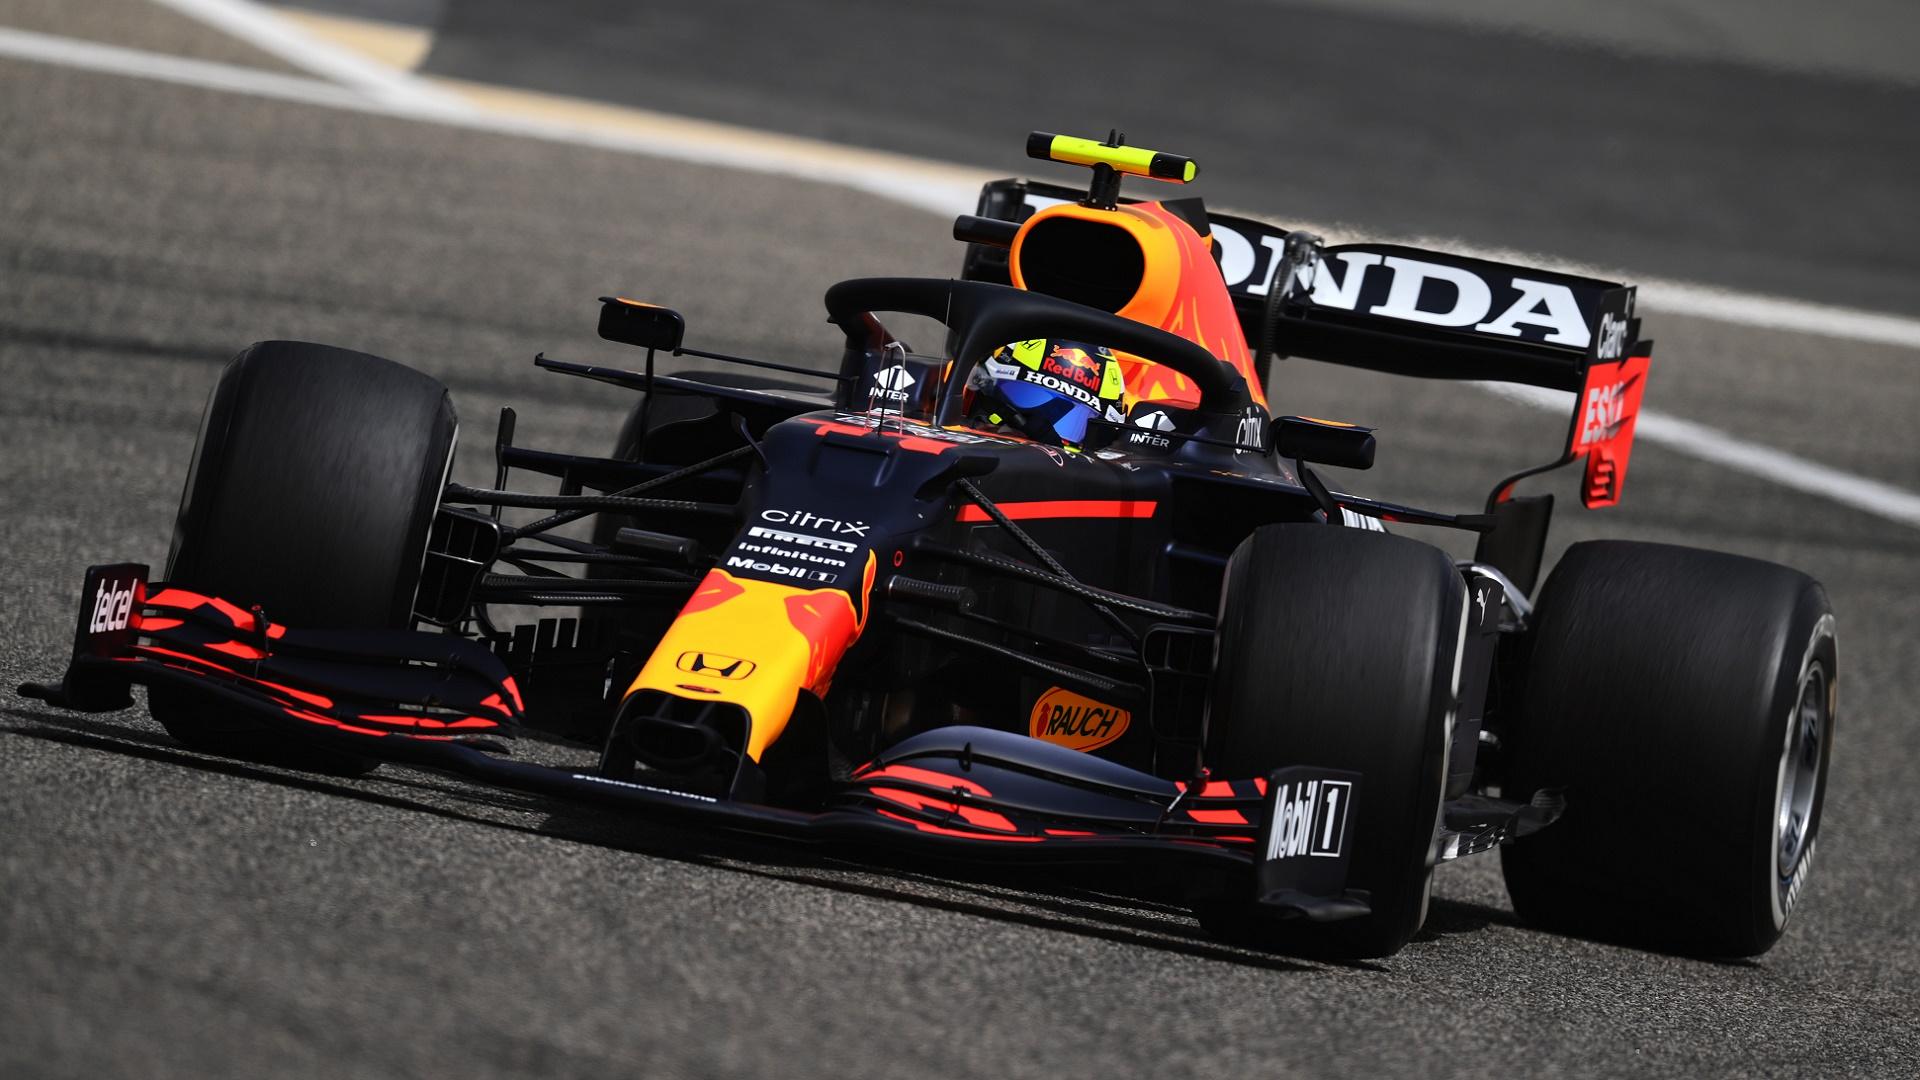 2021-03-13 Perez Red Bull F1 Formula 1